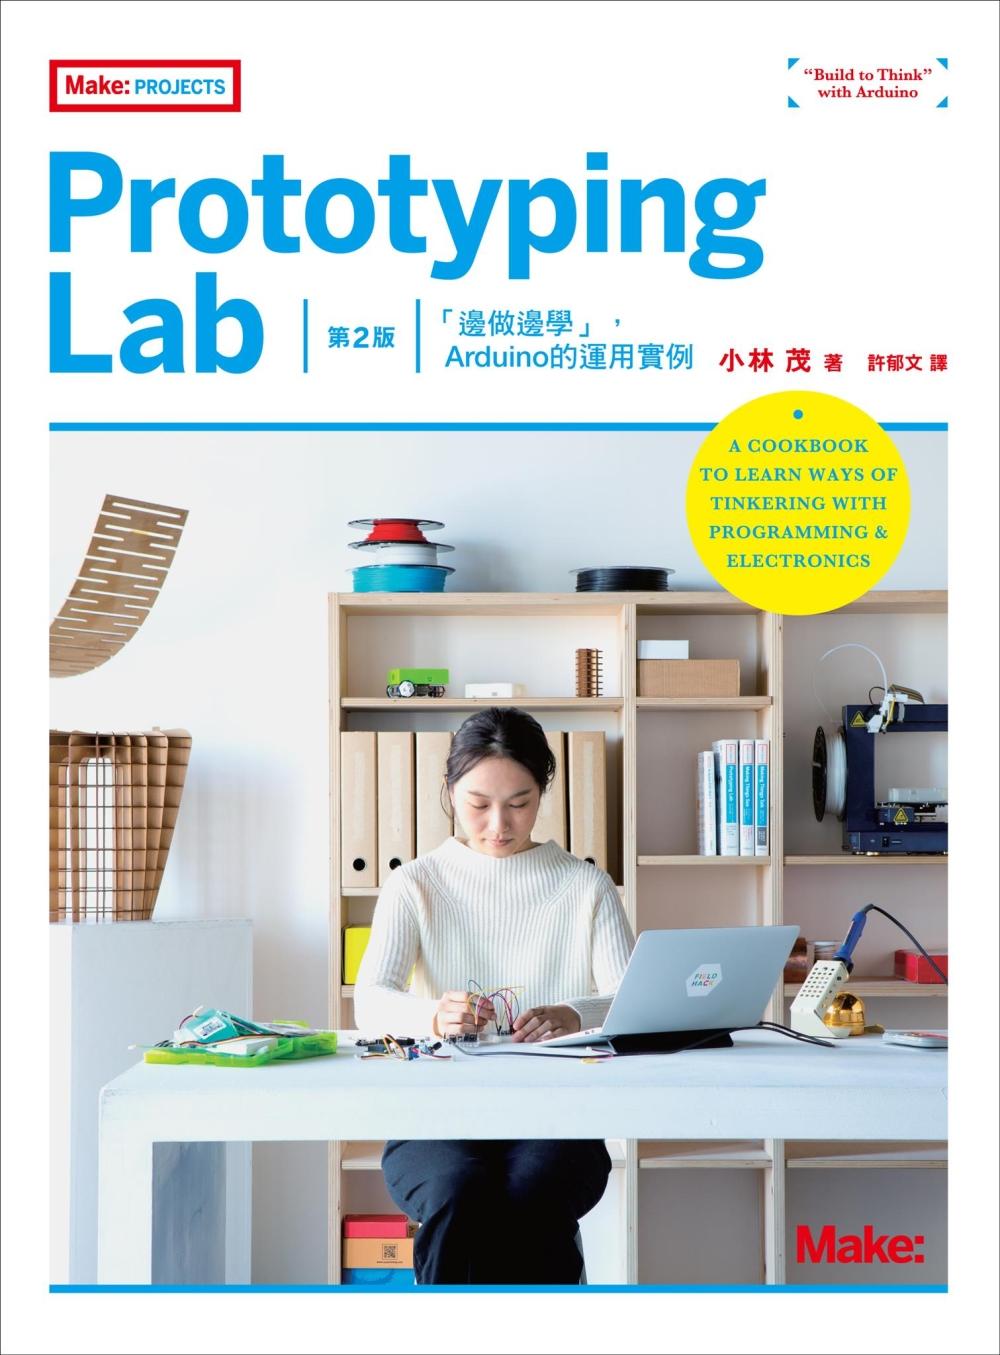 Prototyping Lab...